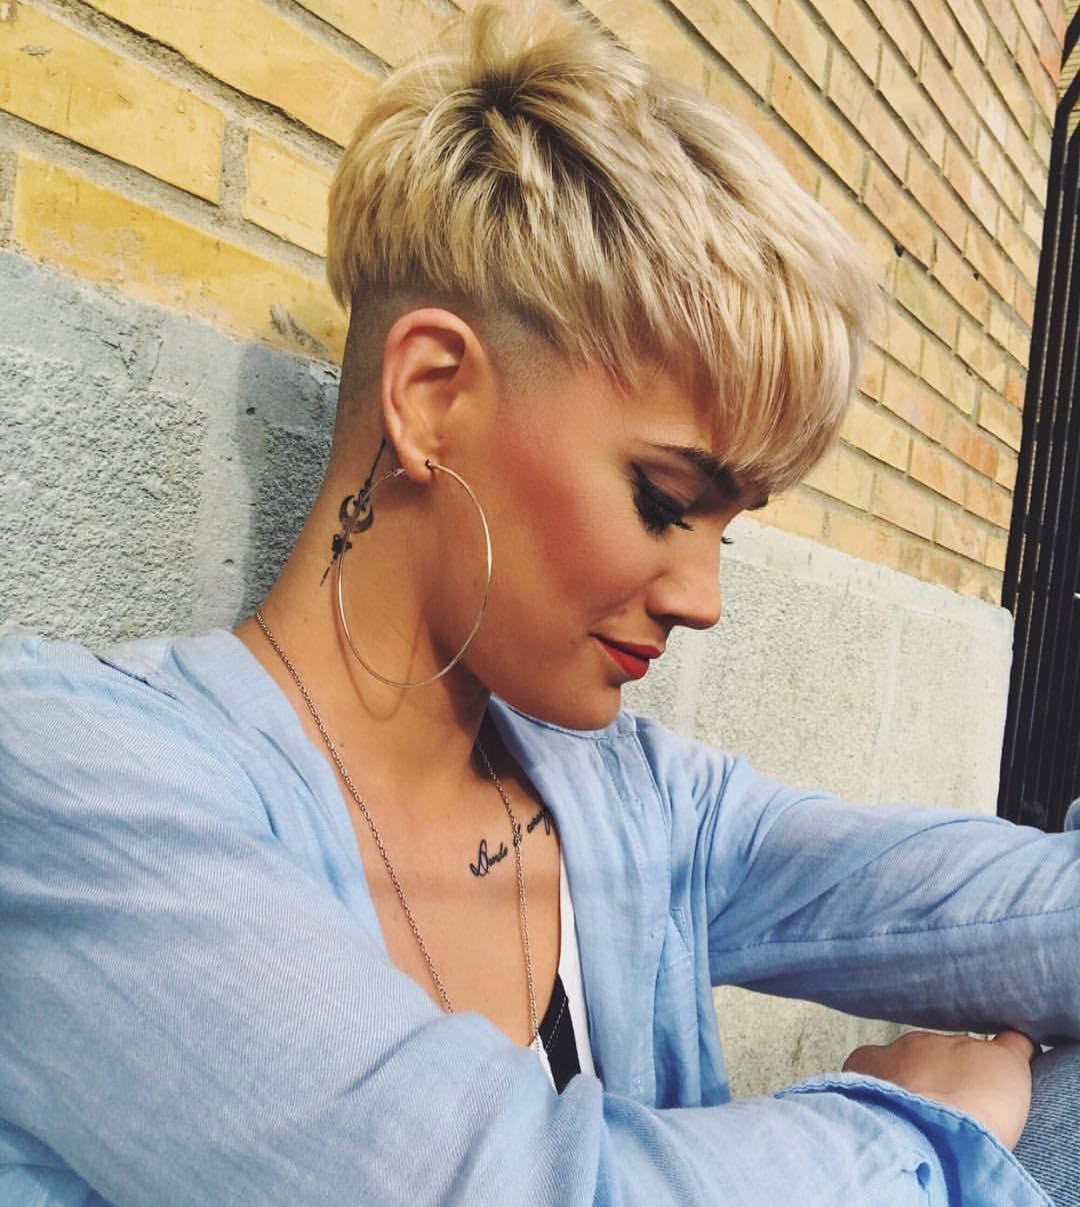 23 Stylish Pixie Haircuts - Women Short Undercut Hairstyles ...